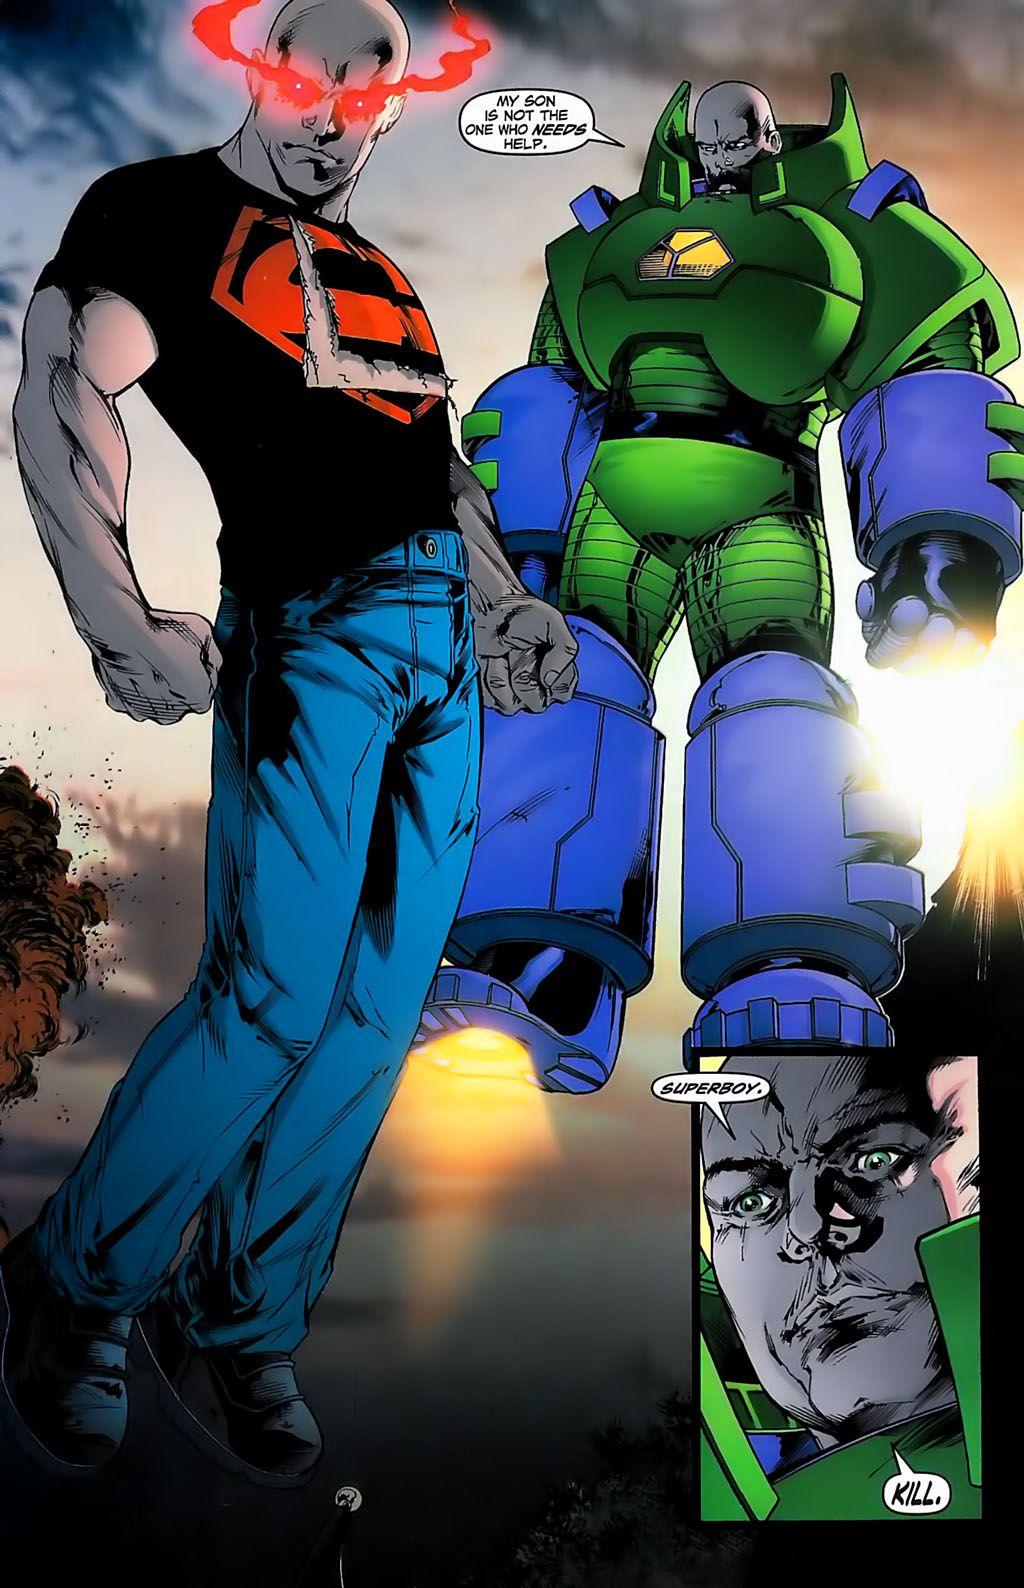 Lex Luthor and Superboy